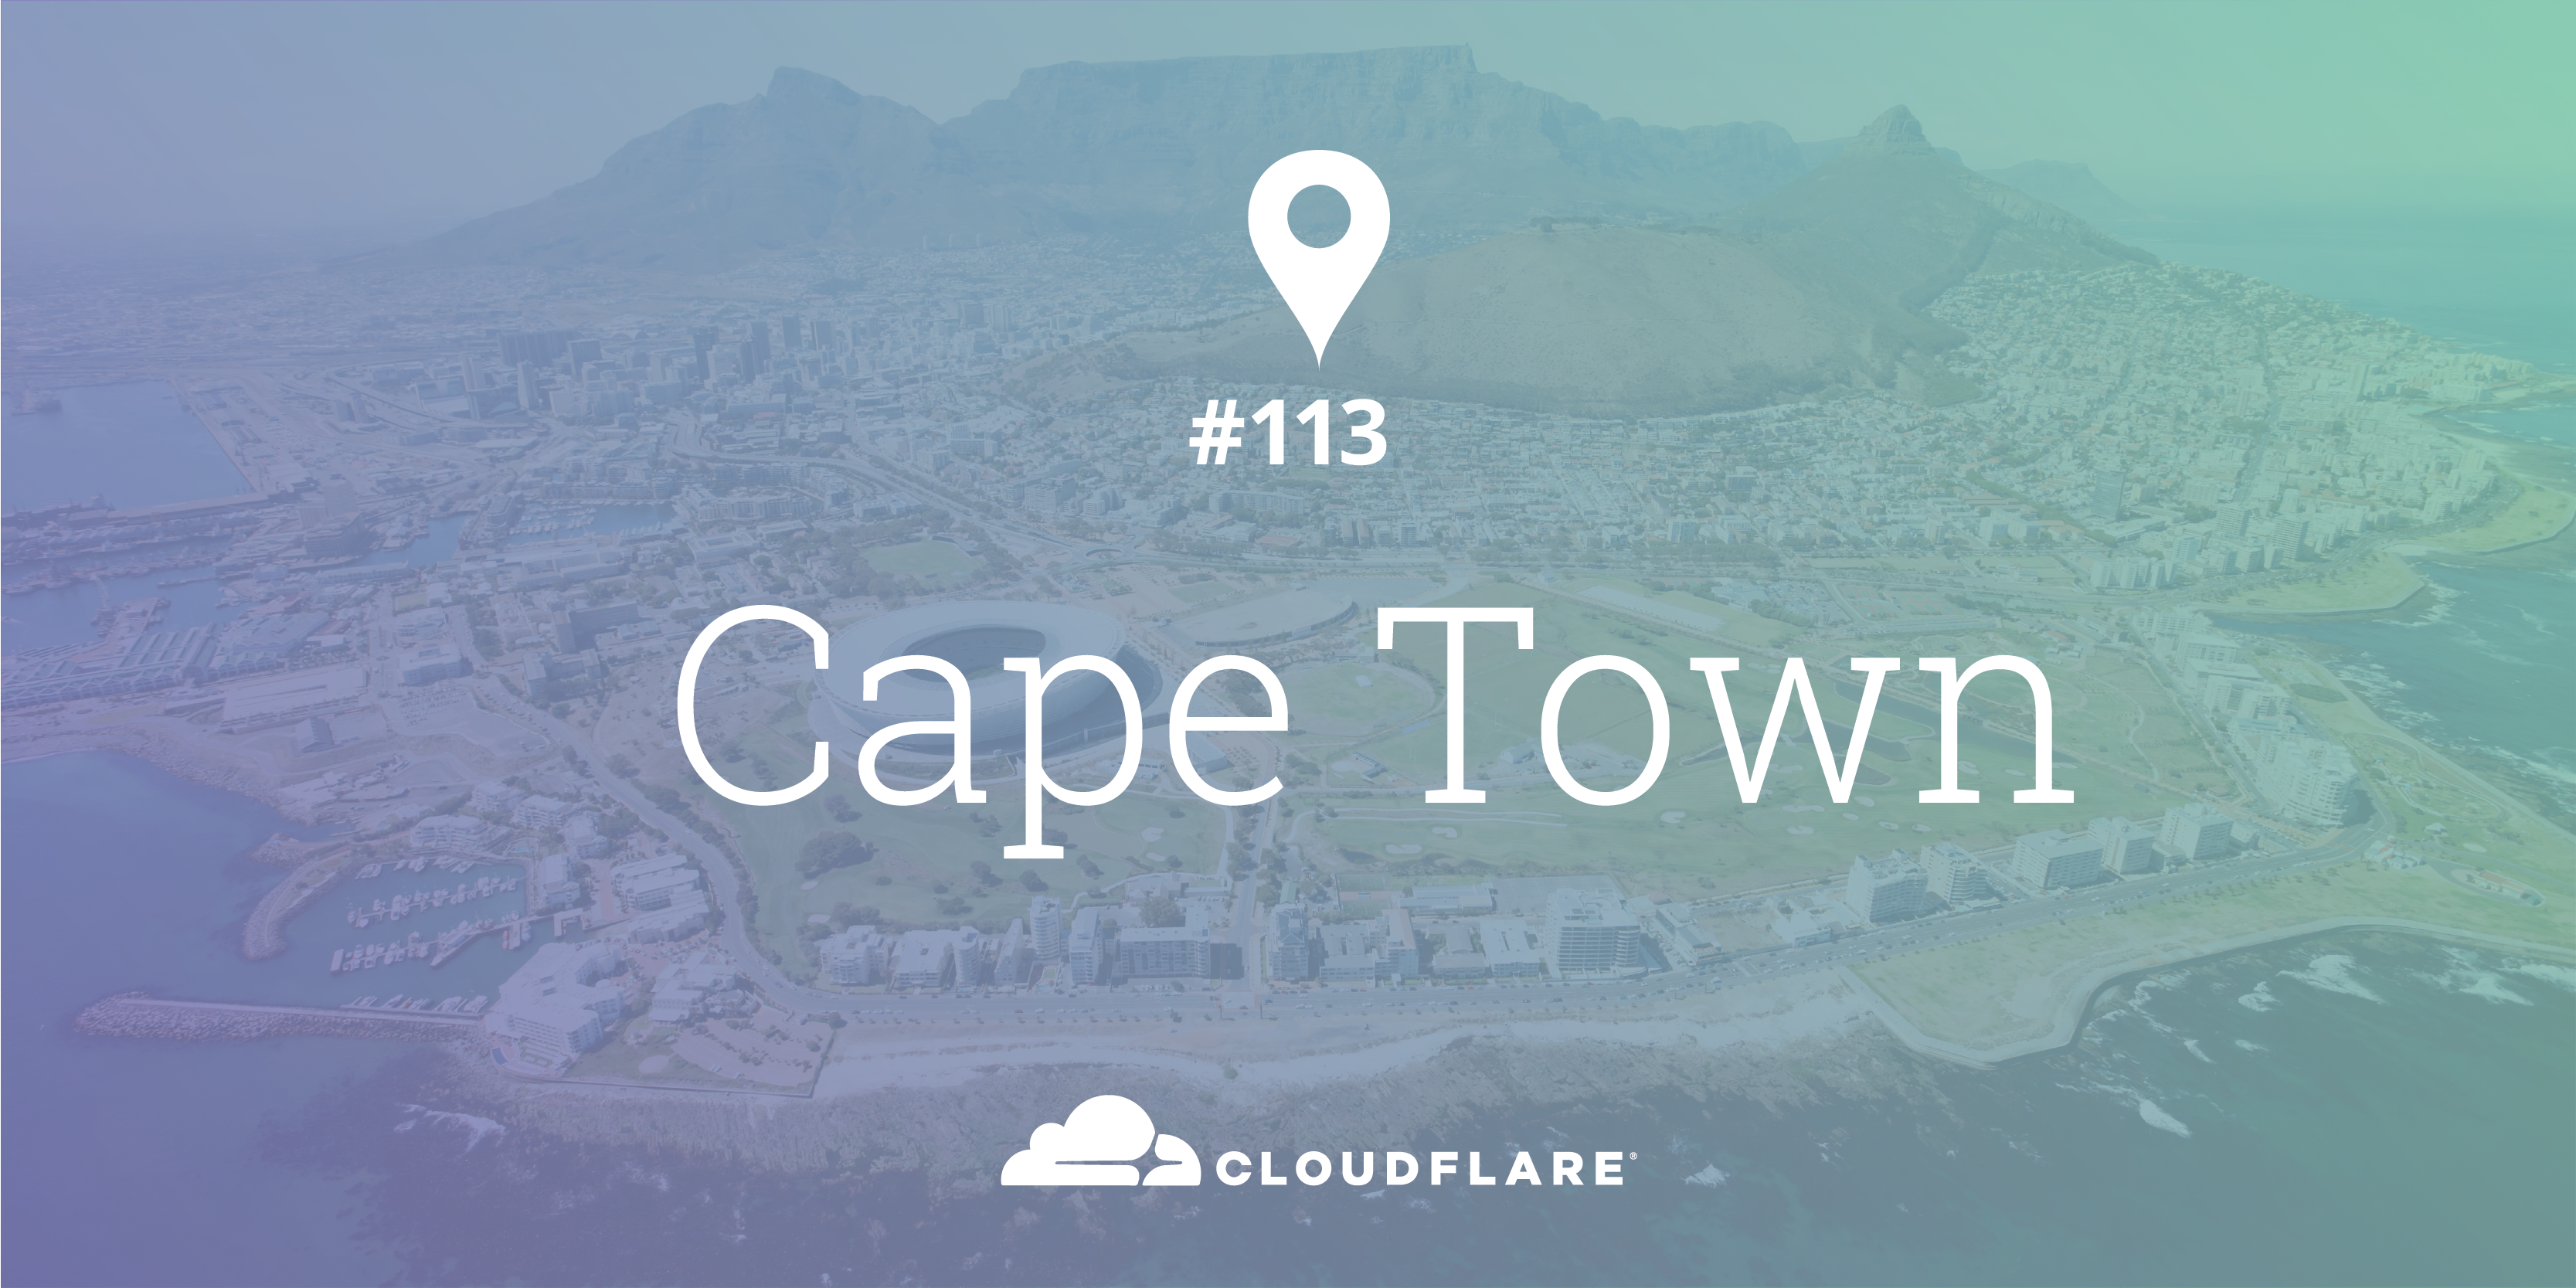 Cloudflare Data Center #113